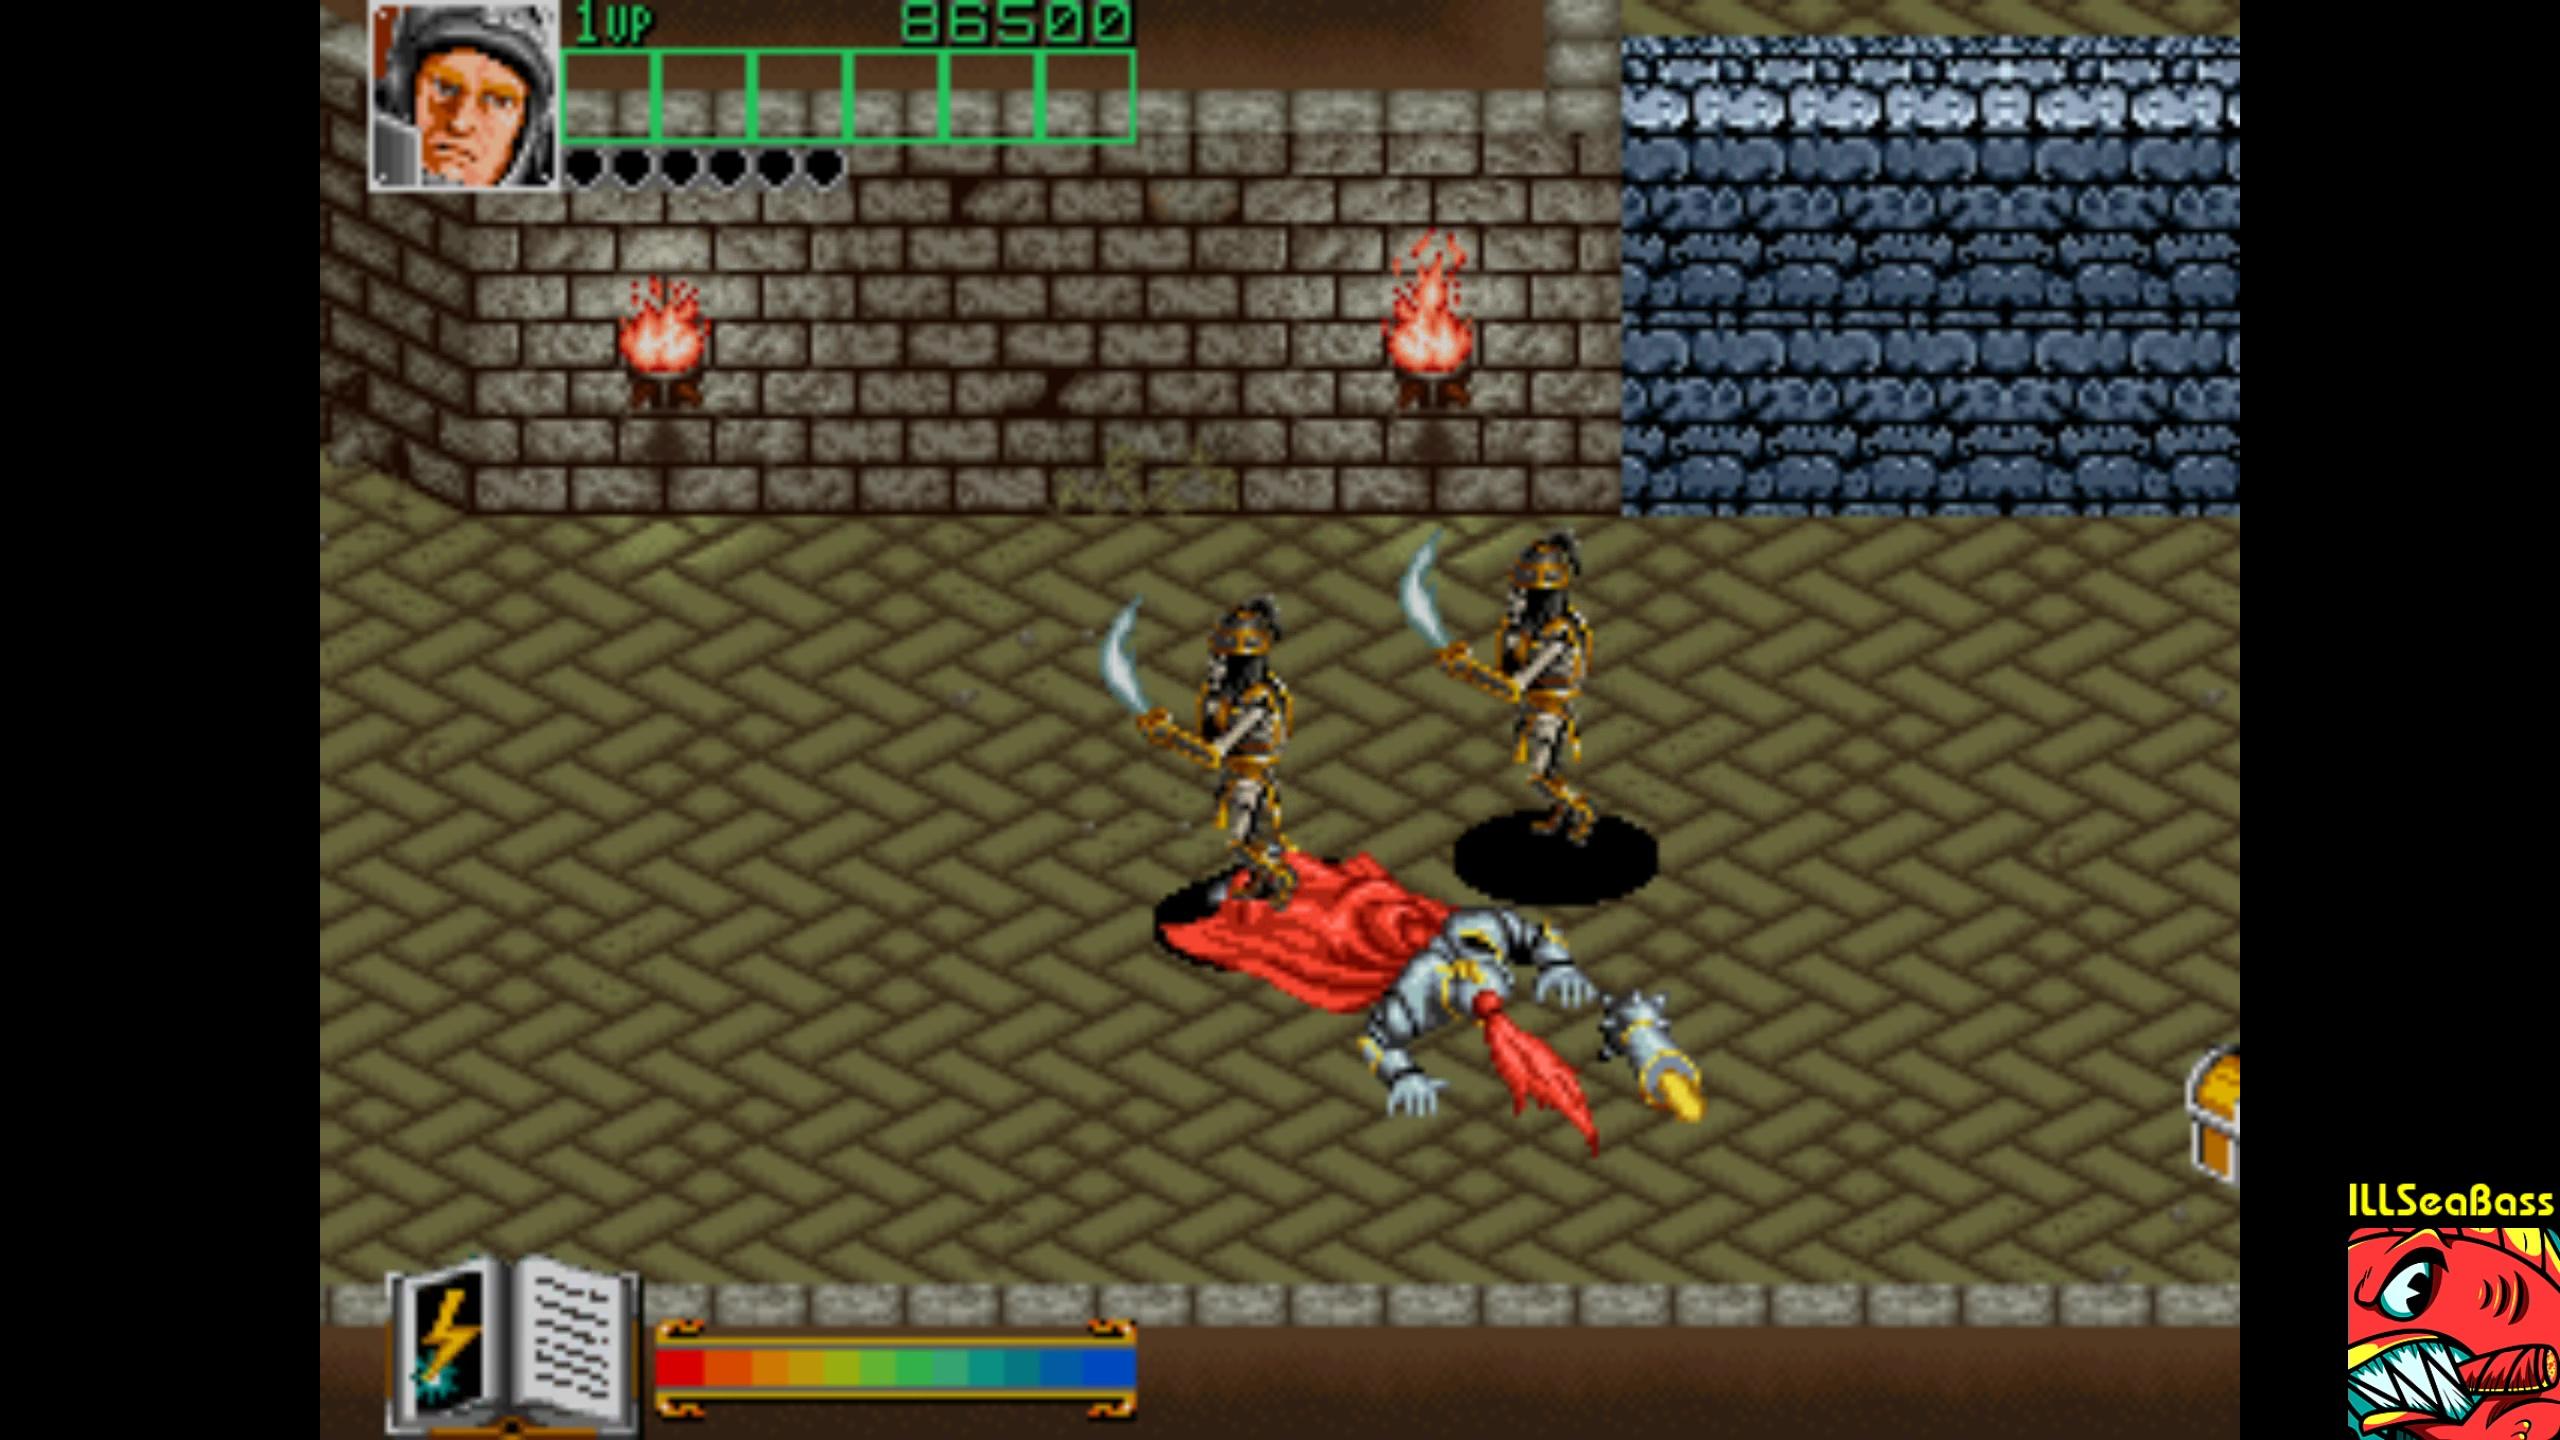 ILLSeaBass: Wizard Fire [wizdfire] (Arcade Emulated / M.A.M.E.) 86,500 points on 2018-02-10 10:01:30